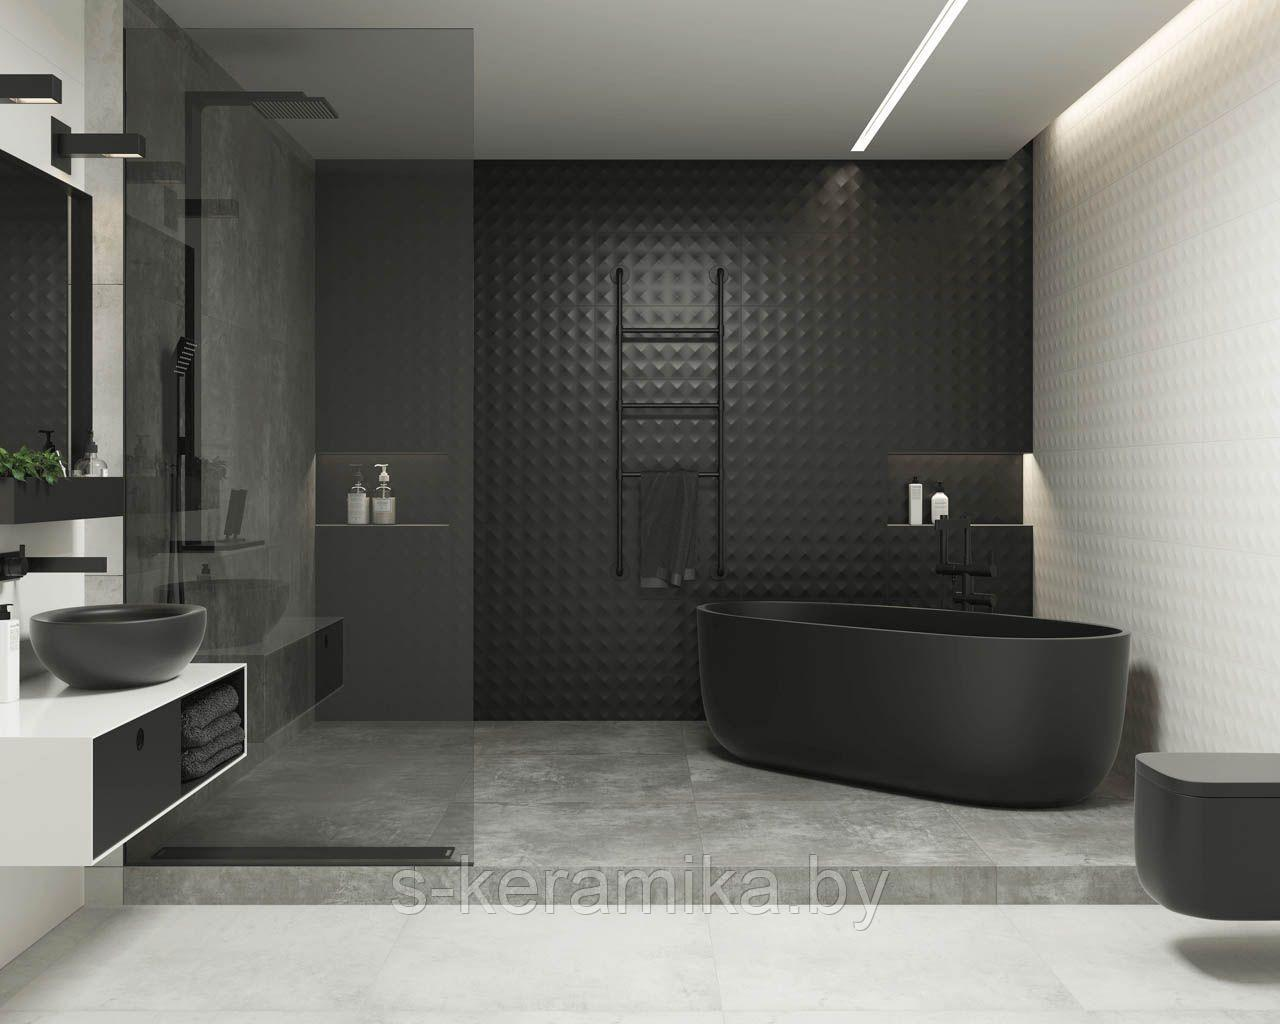 Ванна черного оттенка